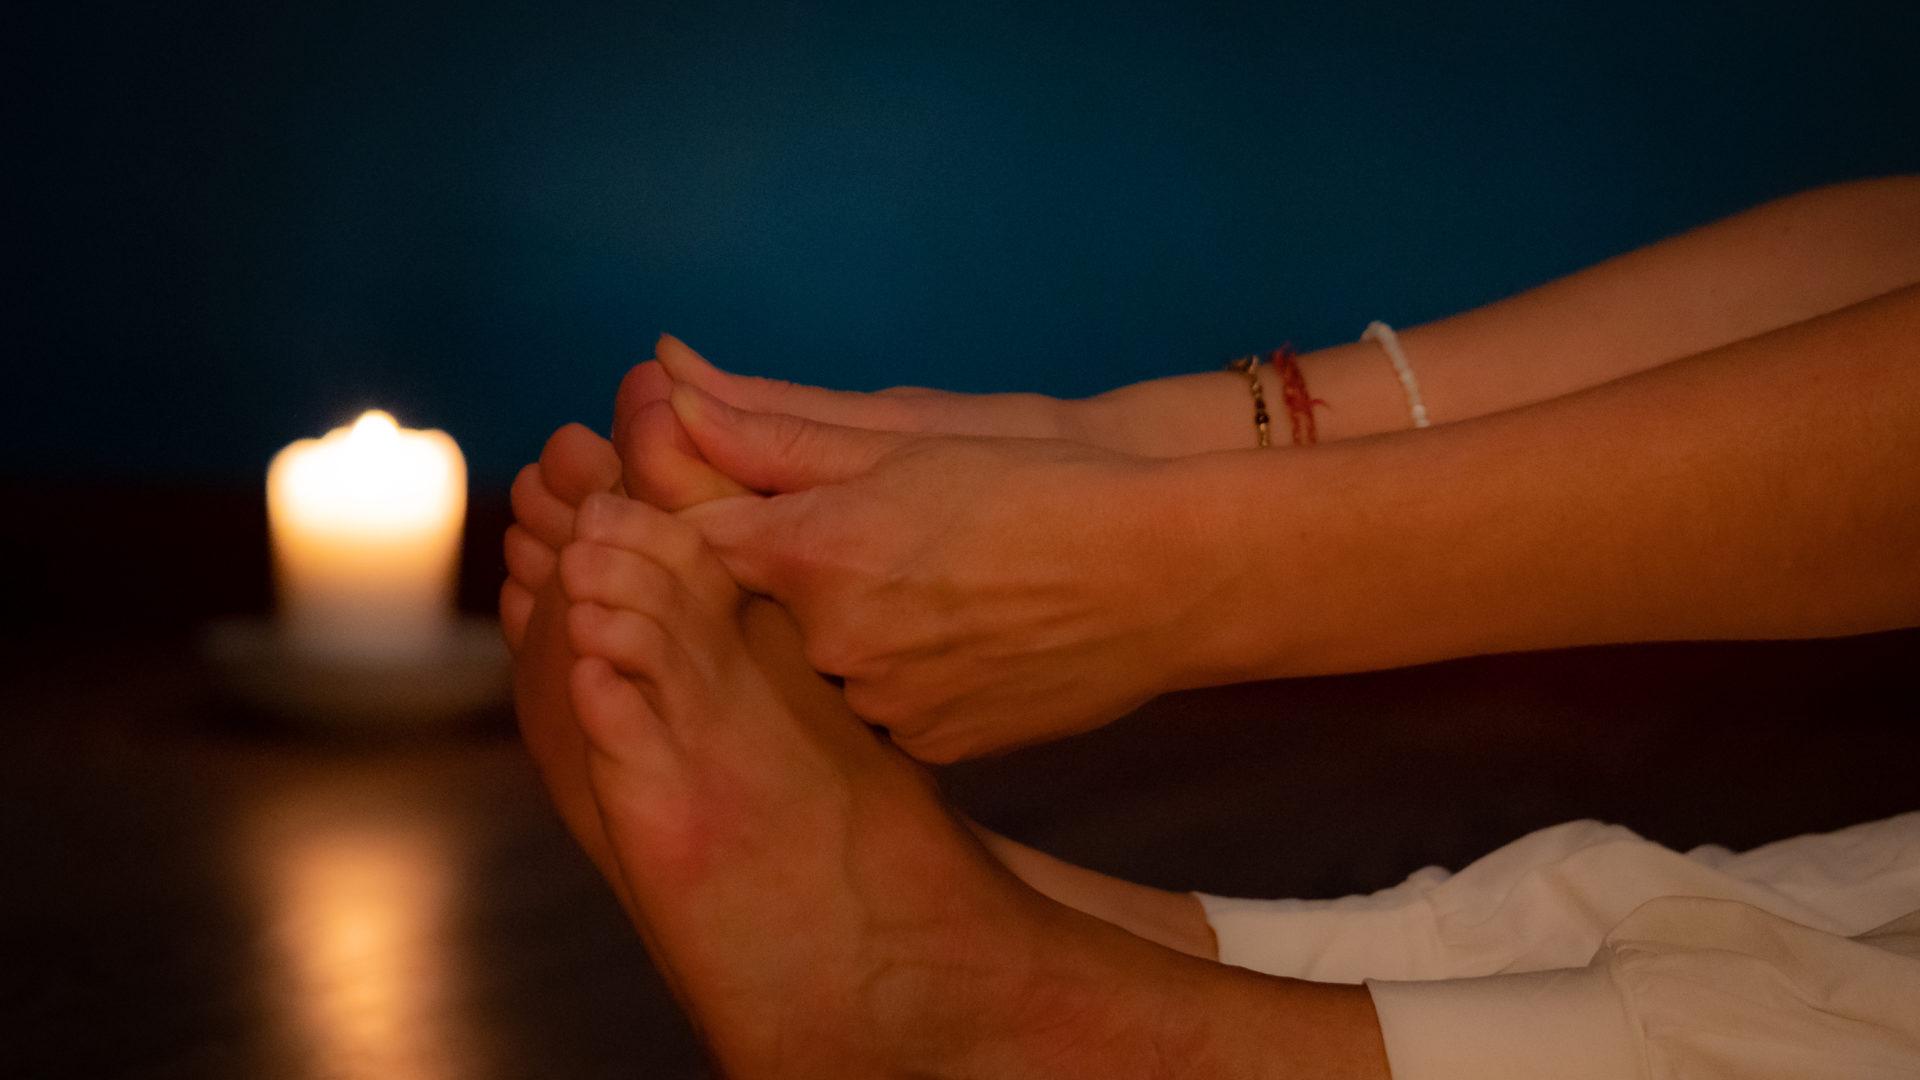 Yoga-Fotografie - Eine Frau berührt ihre Zehenspitzen